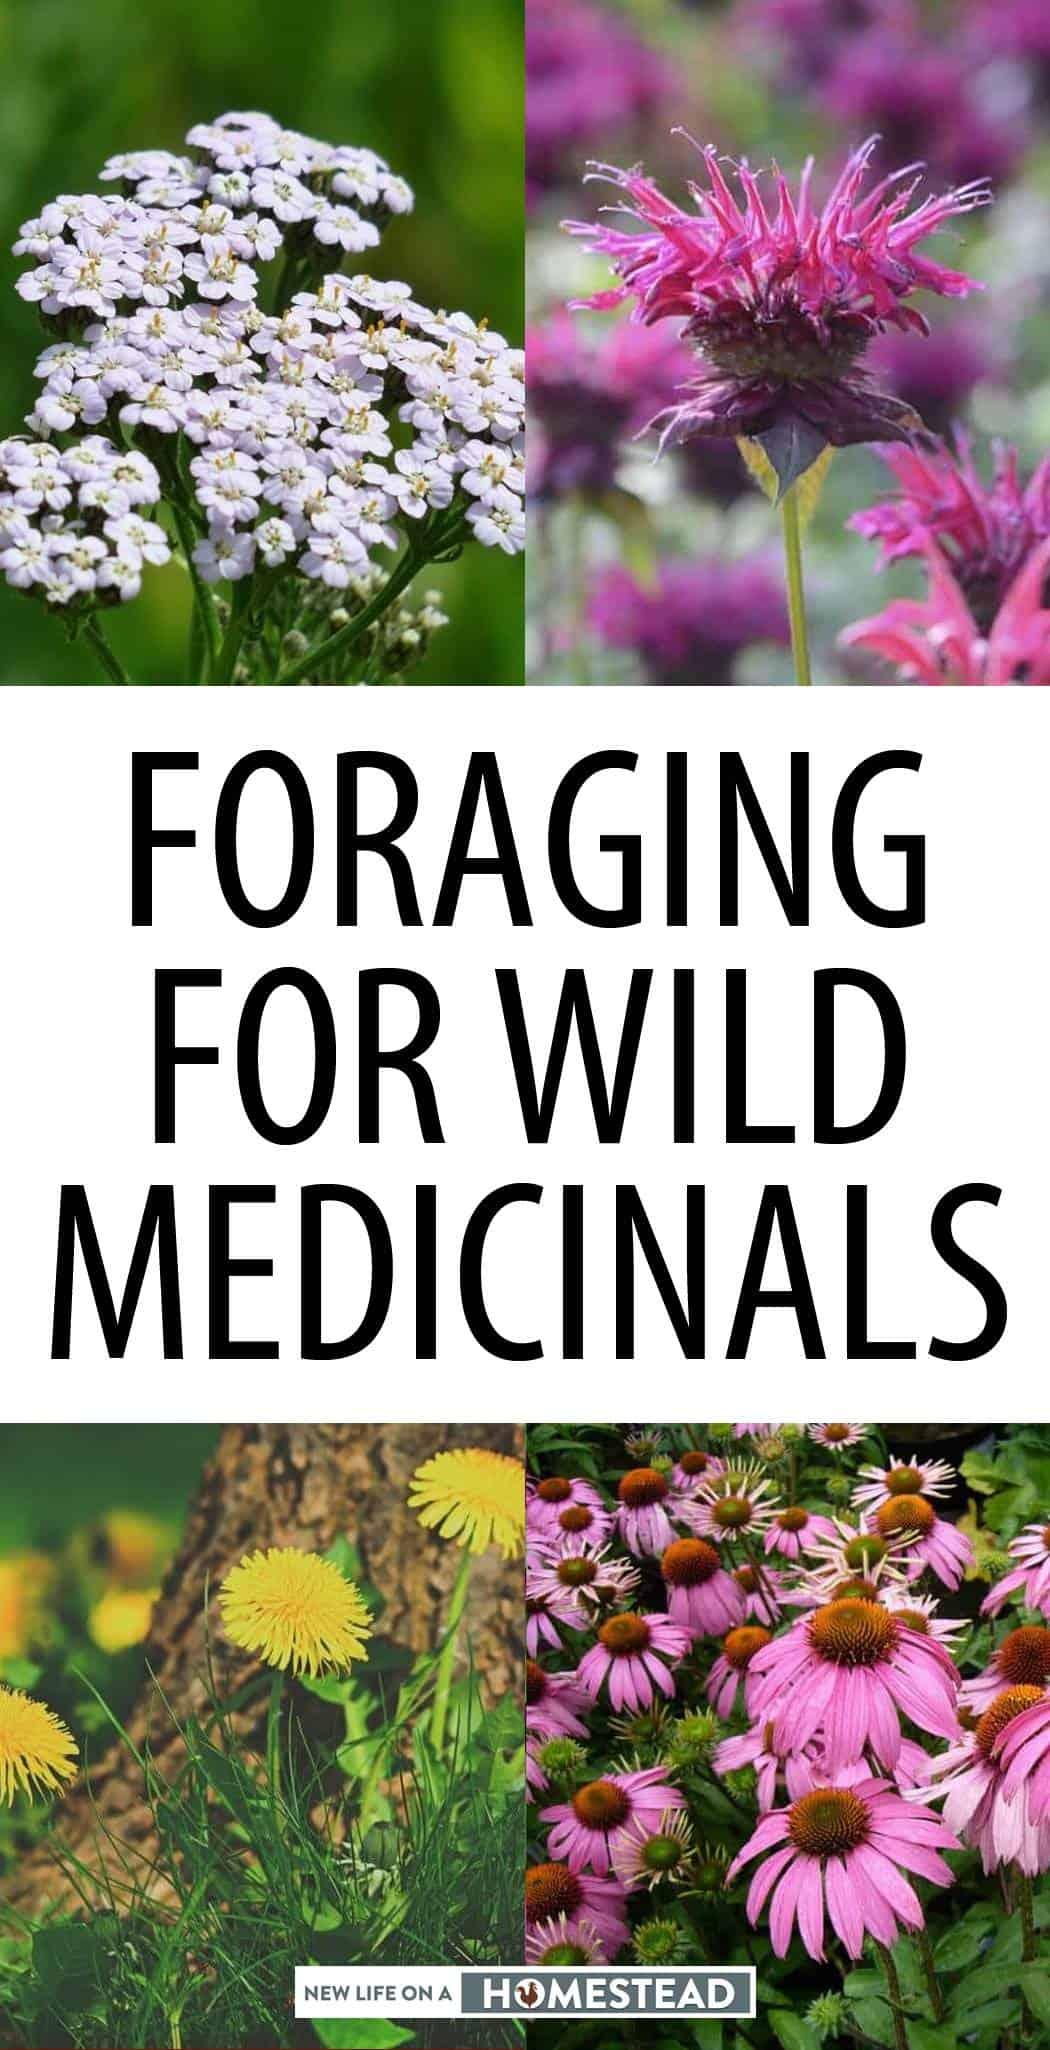 wild medicinals foraging pinterest